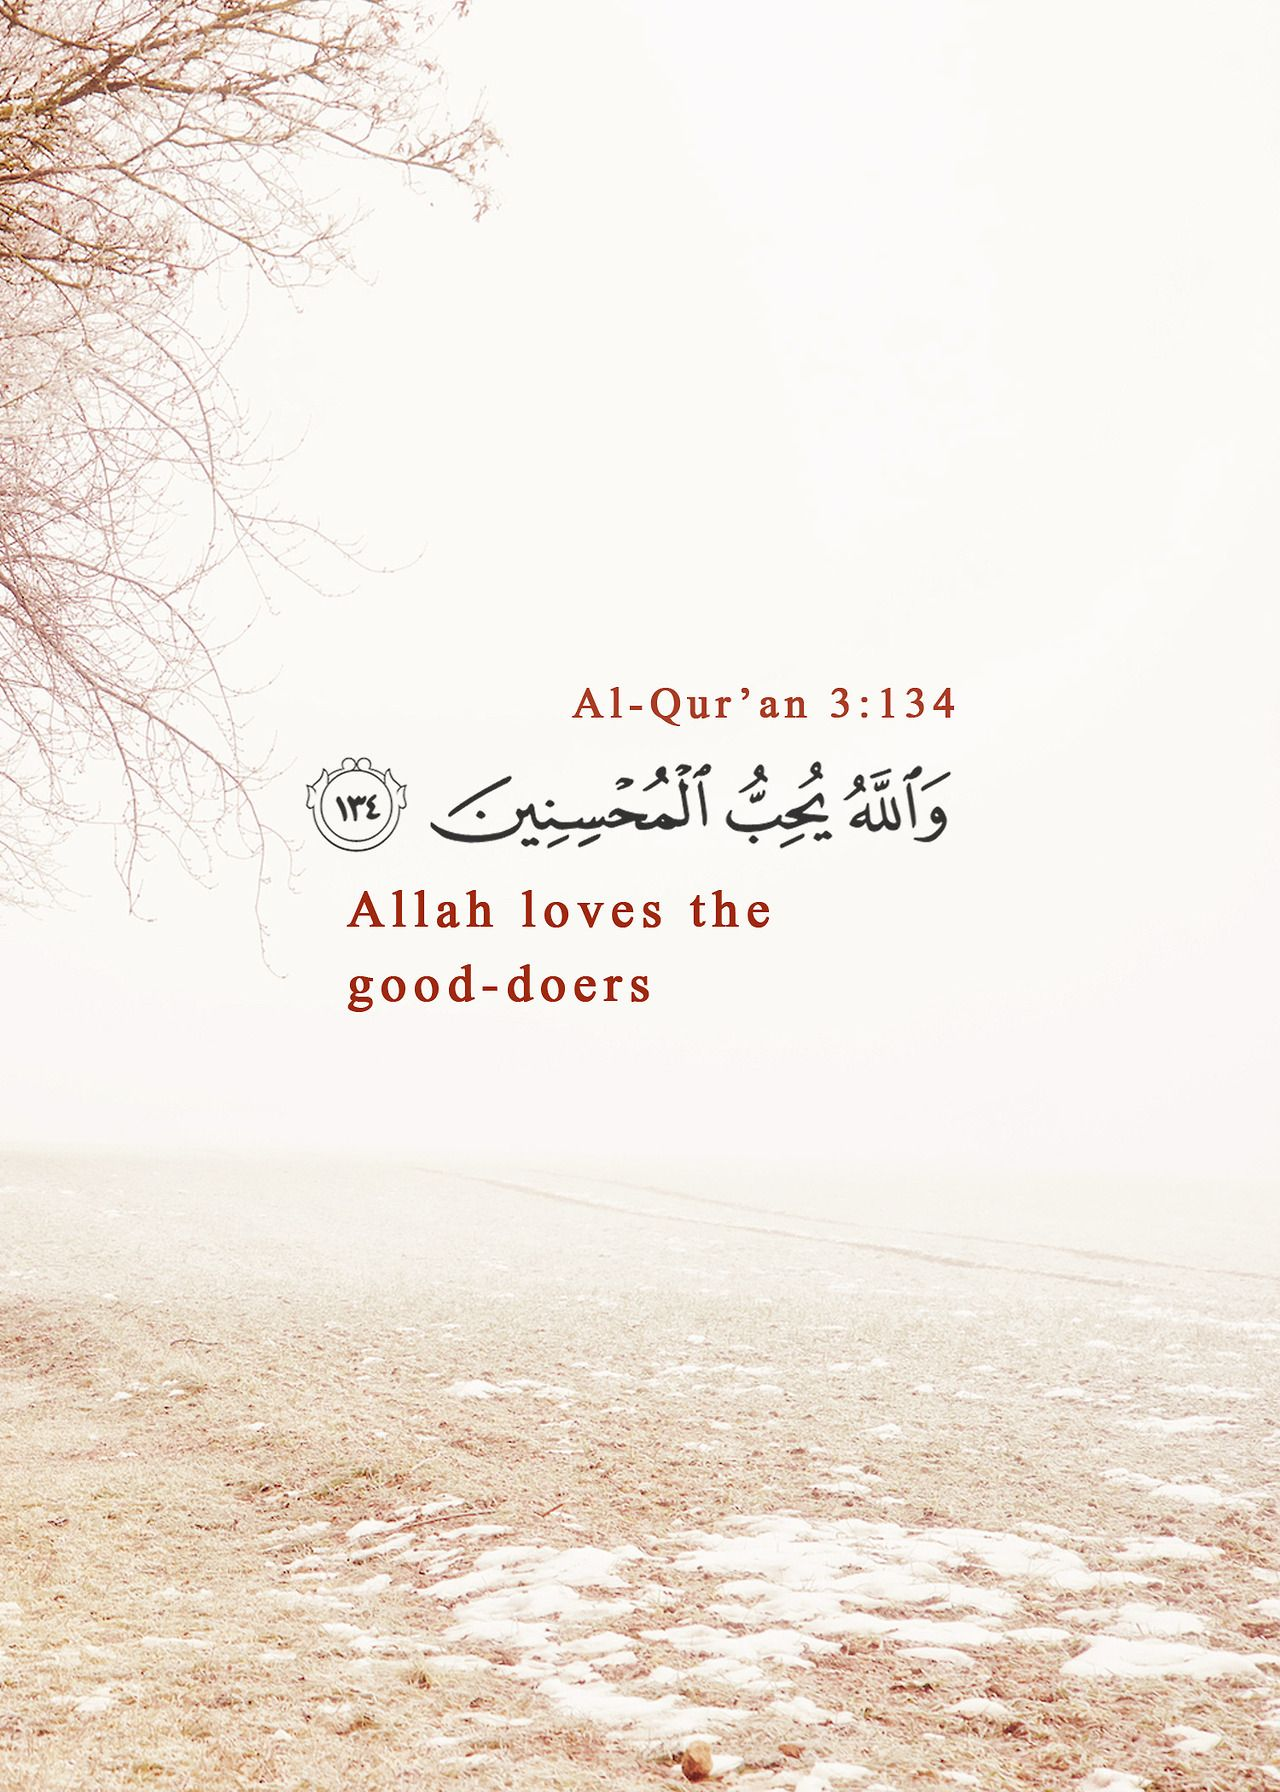 Pin By Medine Durmaz On القرآن الكريم Quran Quran Quotes Allah Love Quran Quotes Love